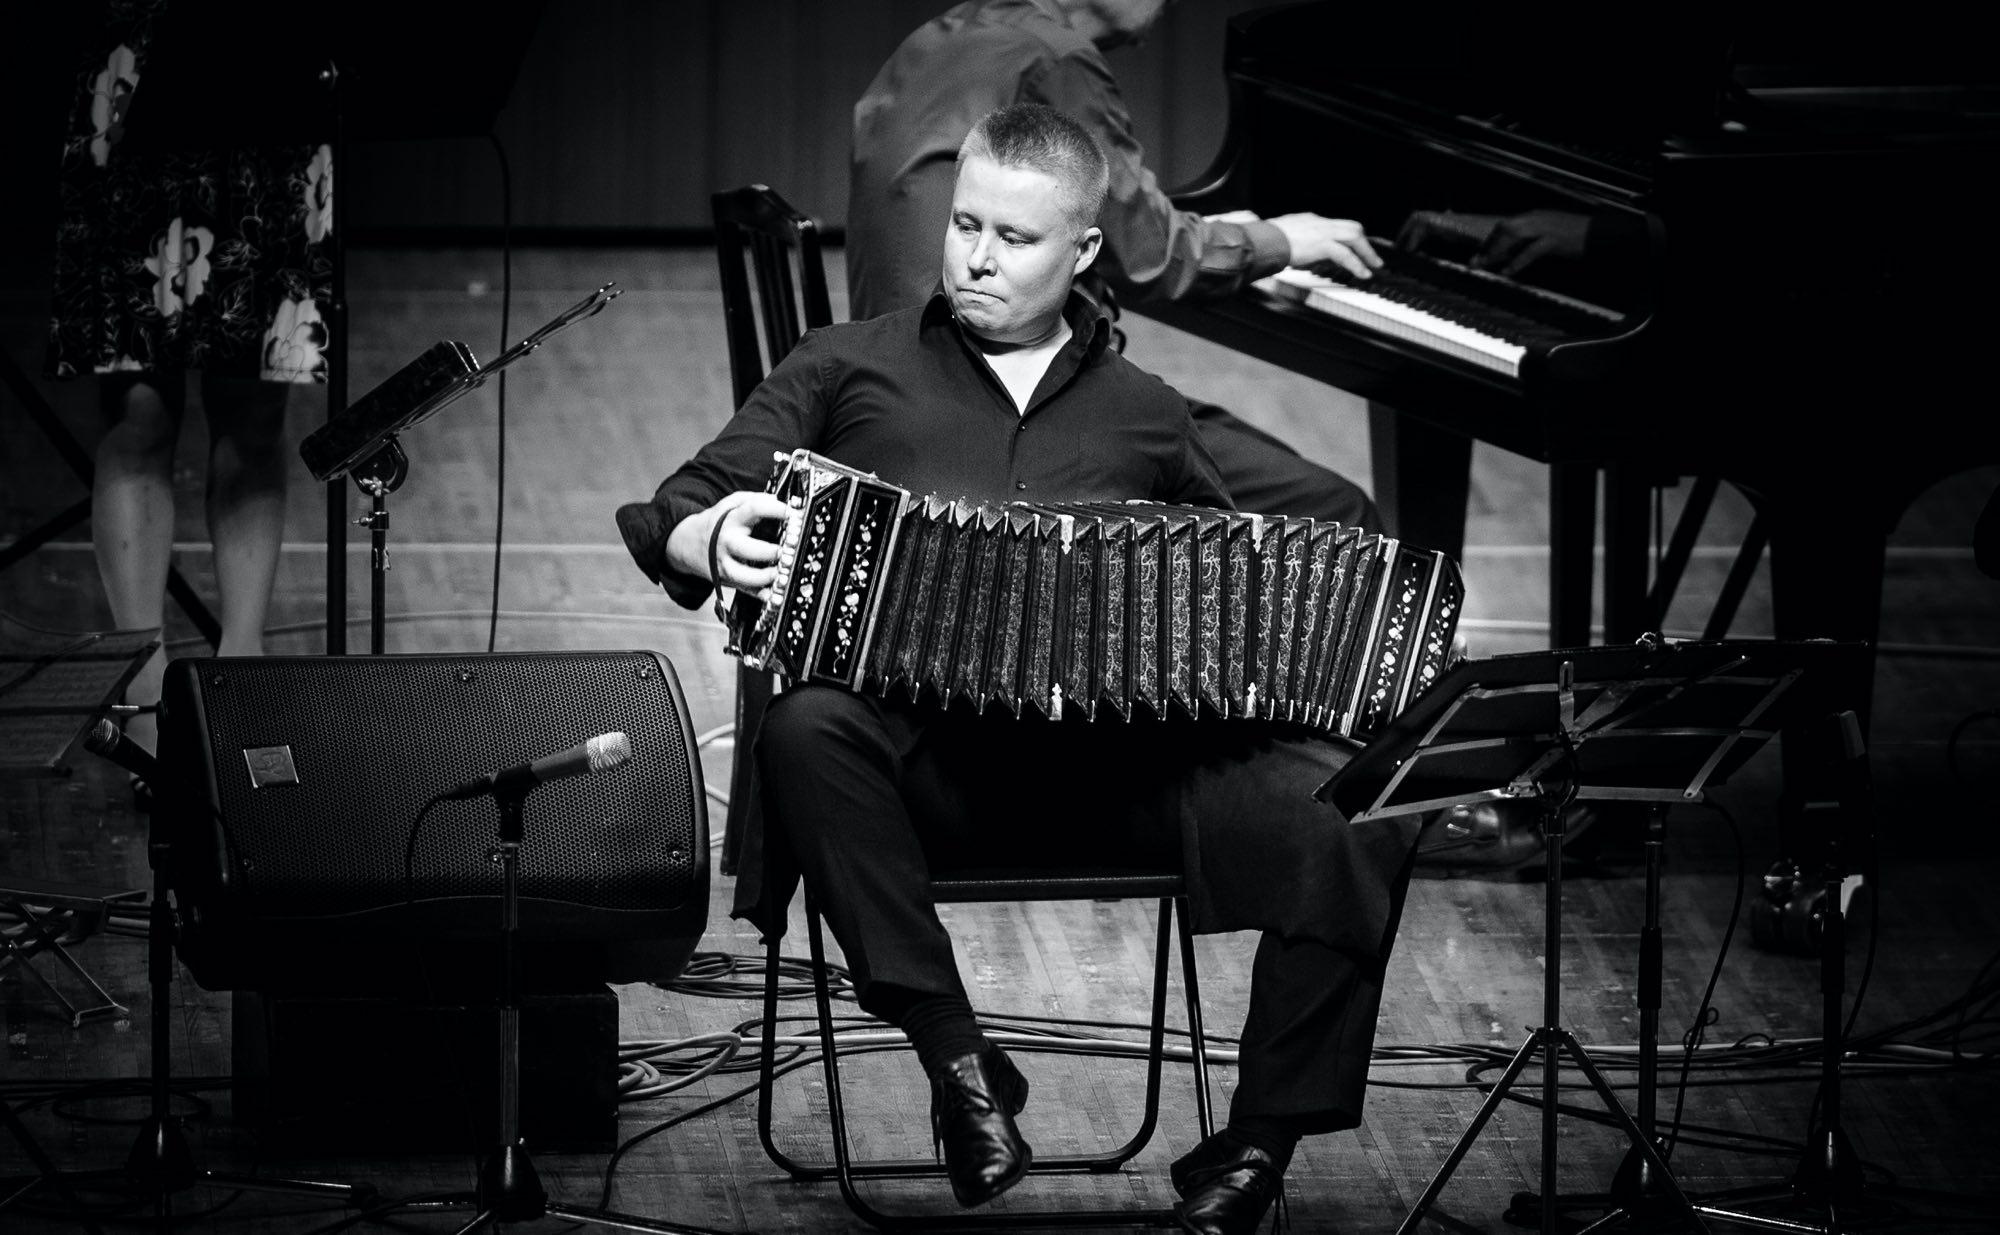 Ville Hiltula playing accordeon